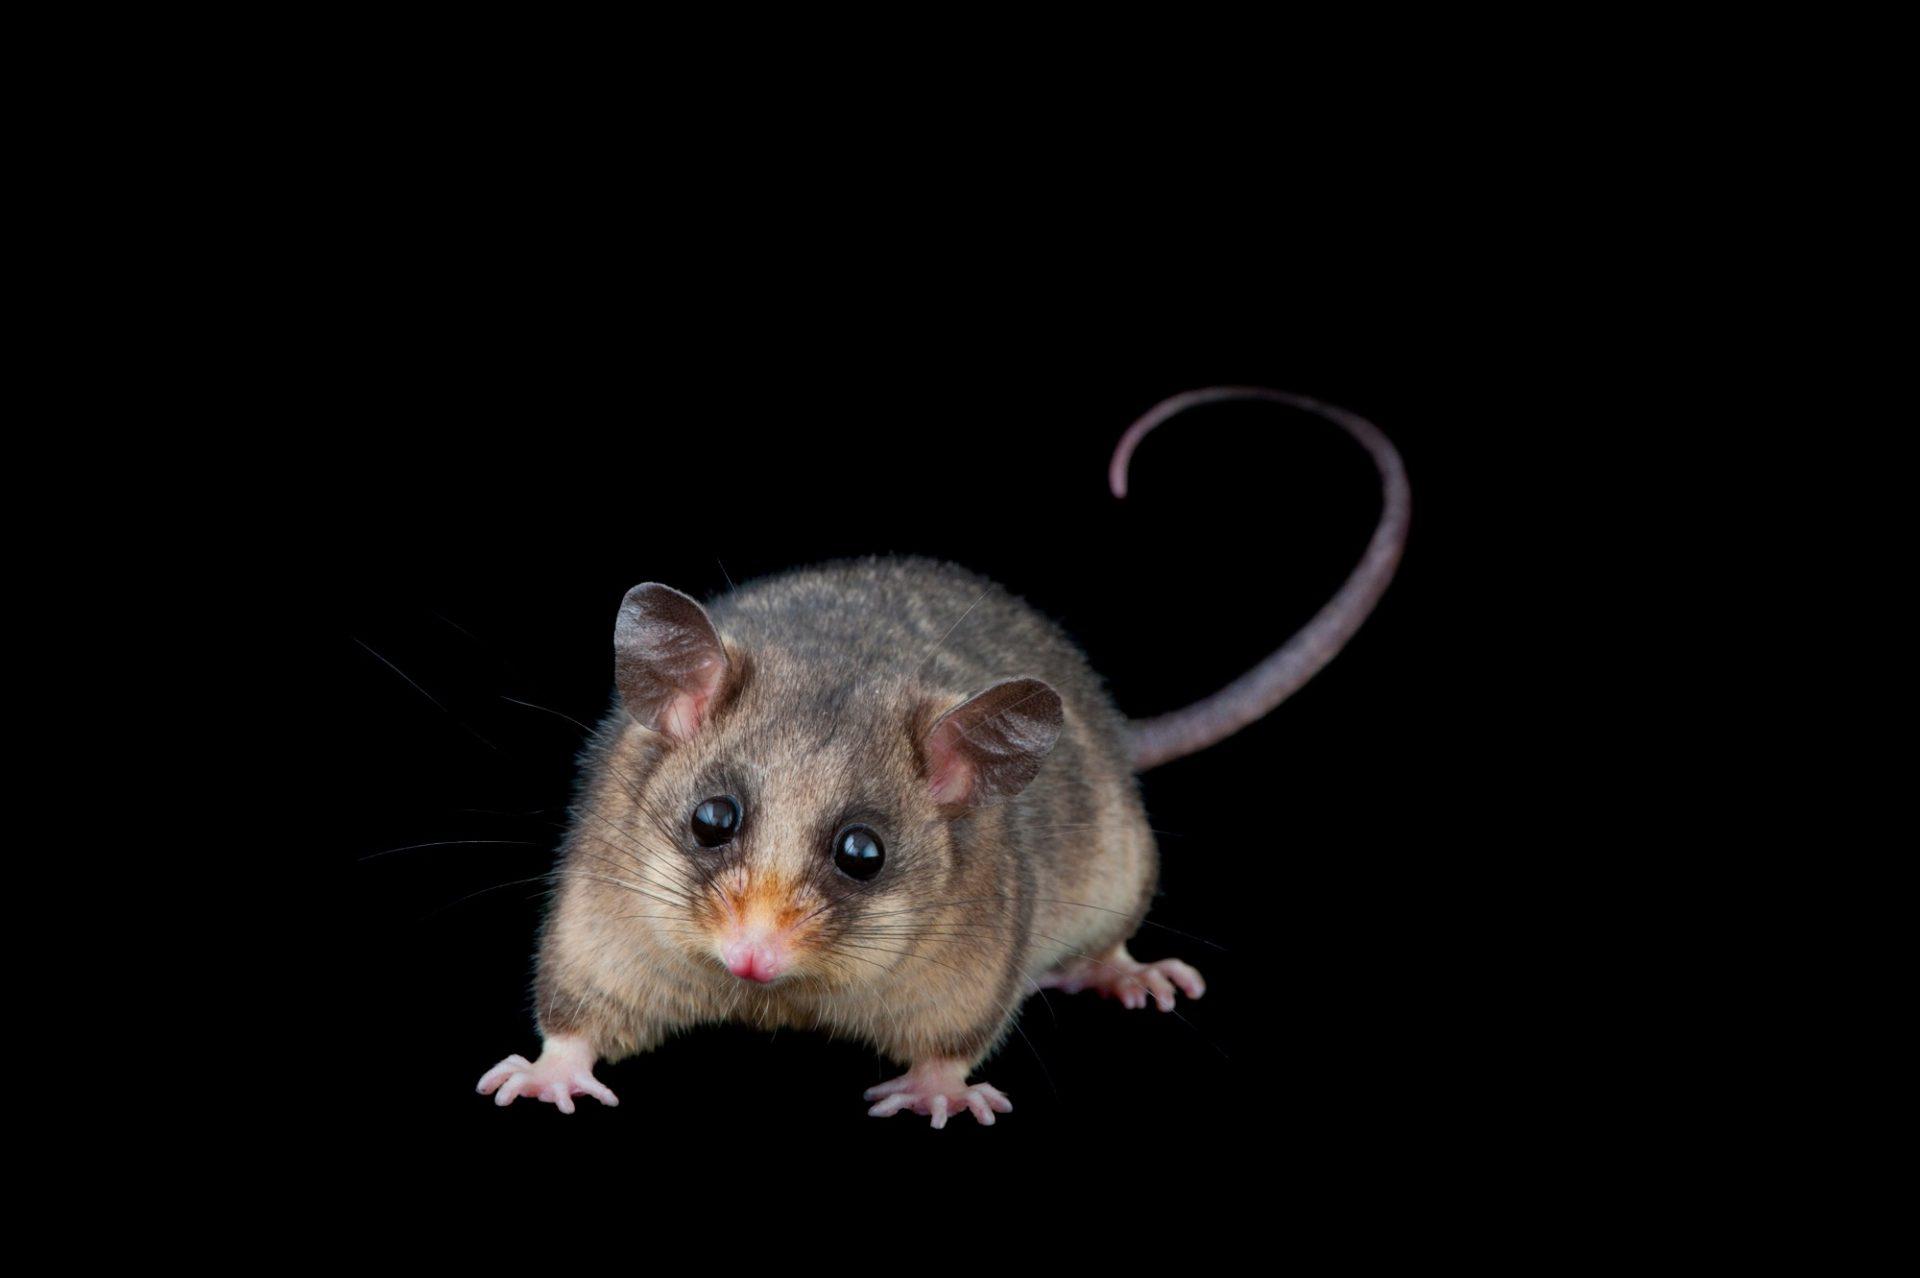 A mountain pygmy possum (Burramys parvus) a critically-endangered mammal from Victoria, Australia.